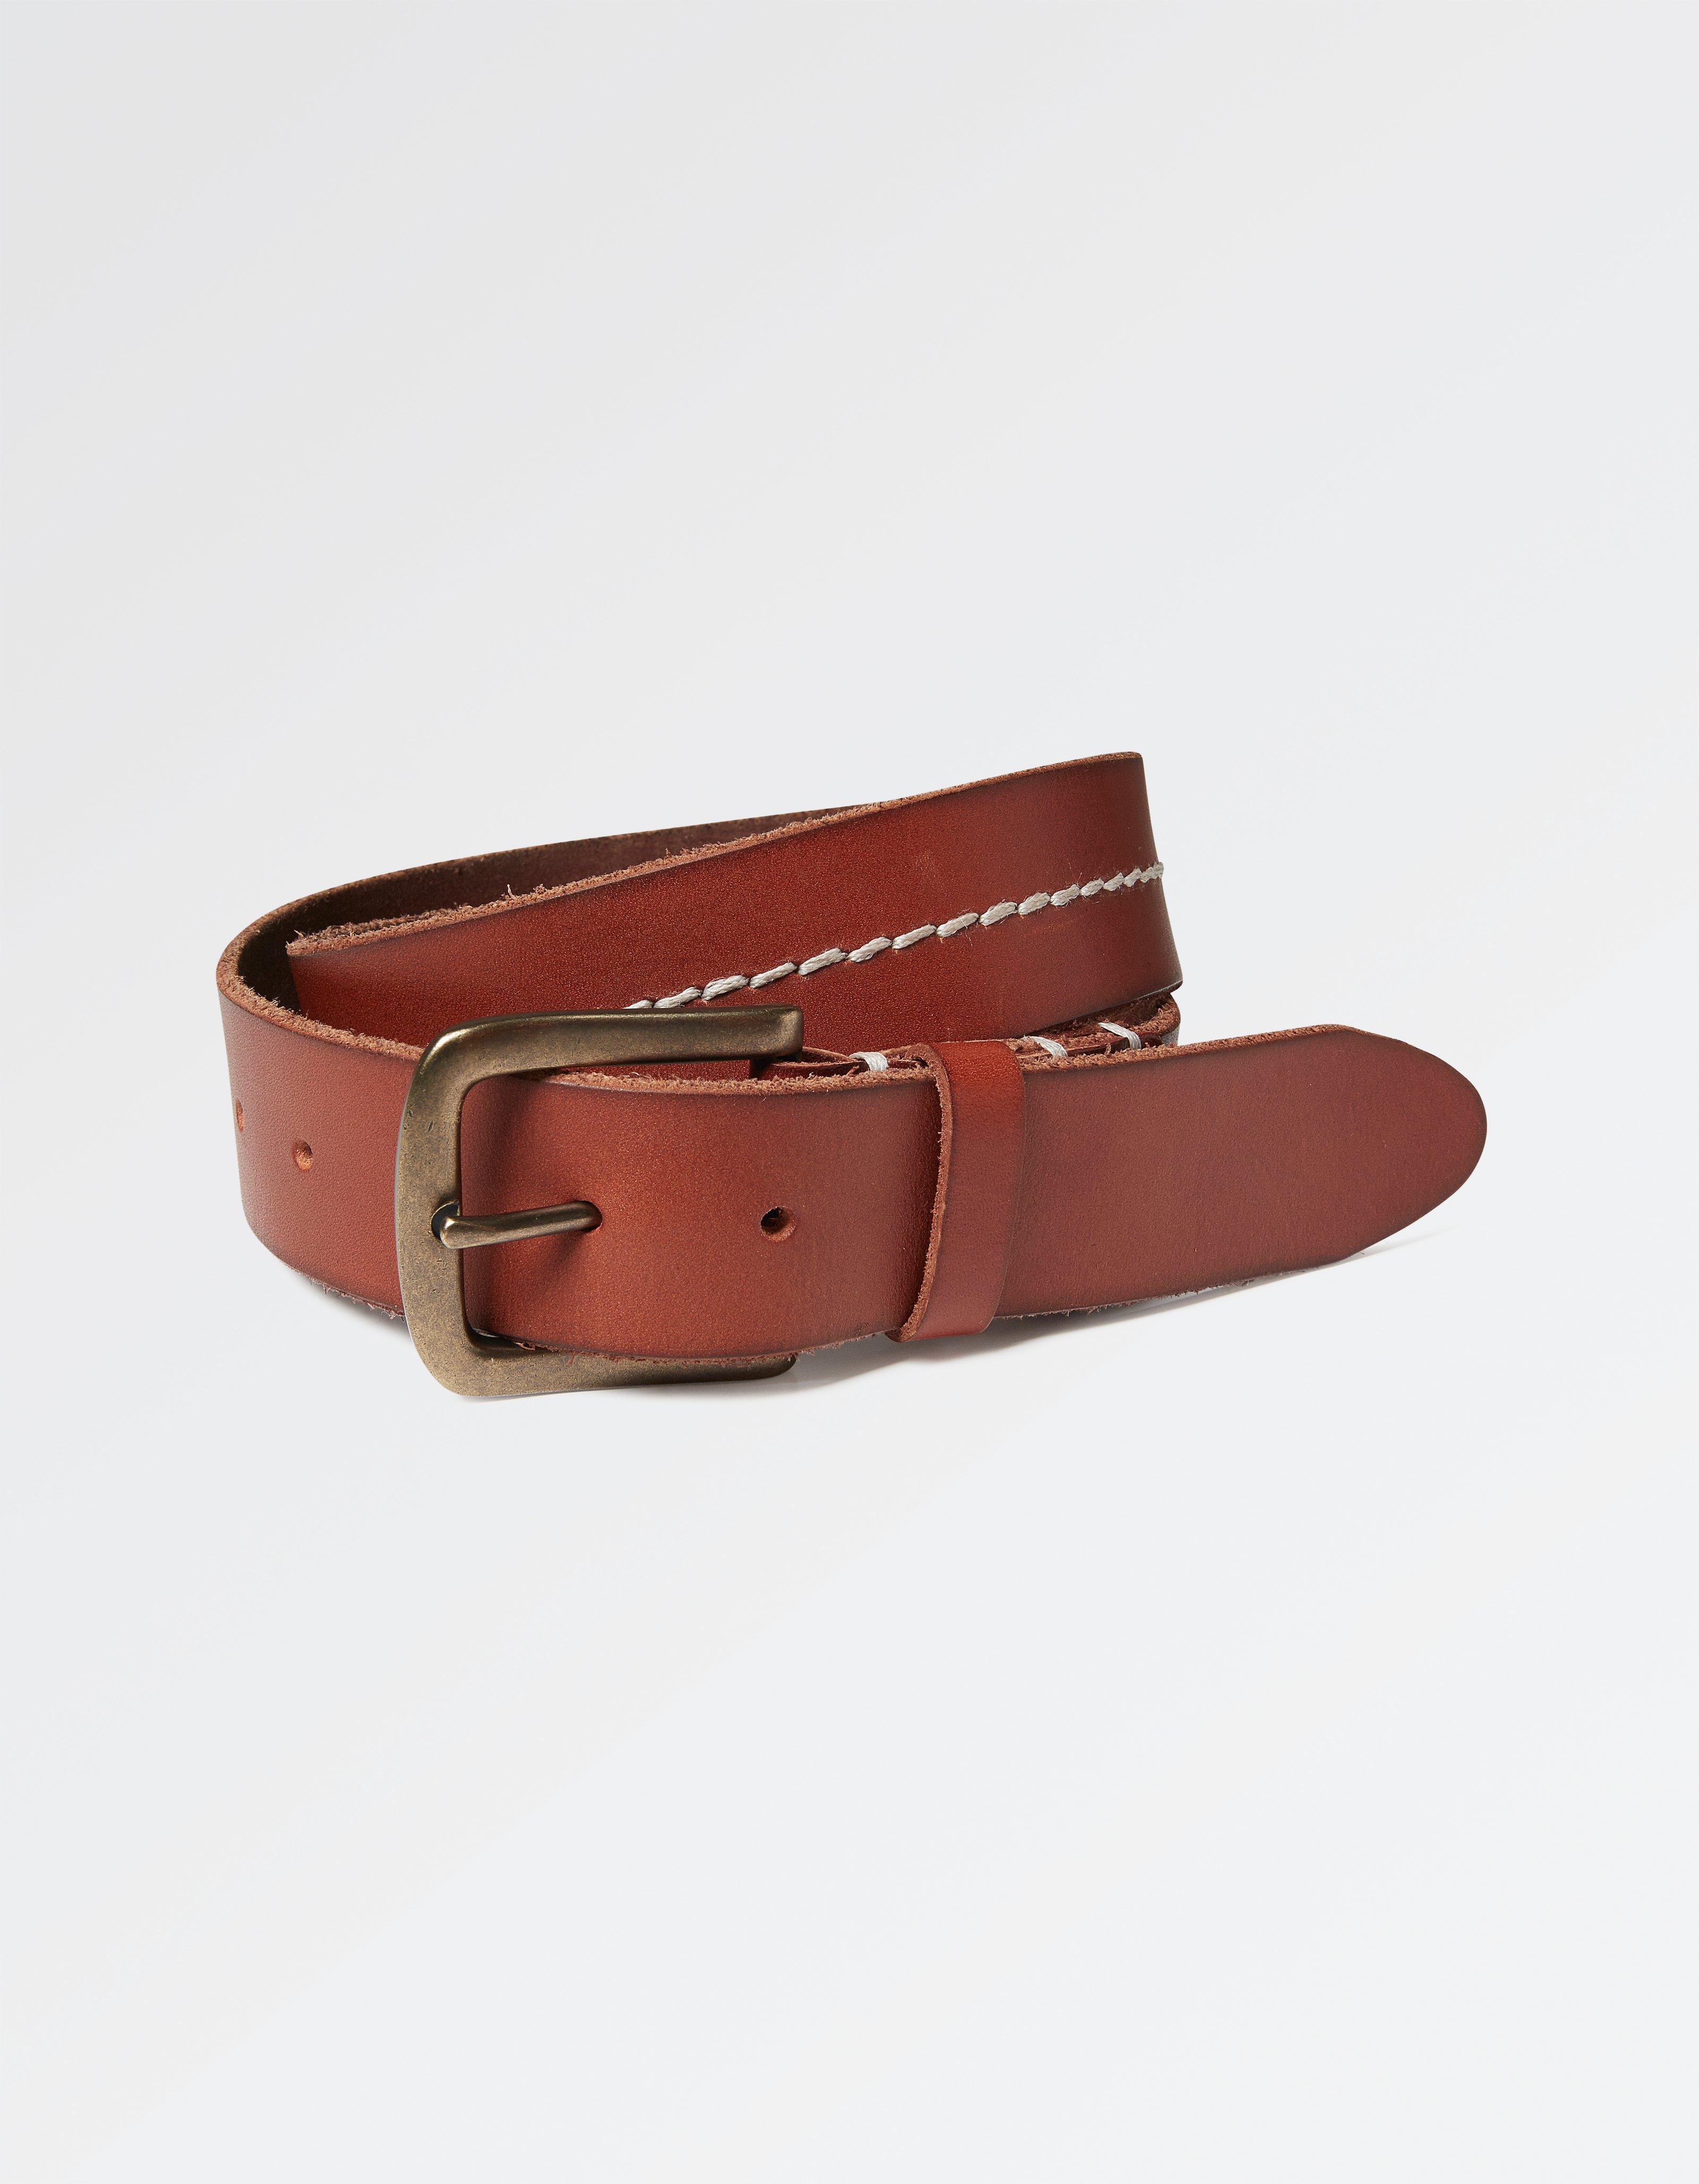 Stab Stitch Leather Belt